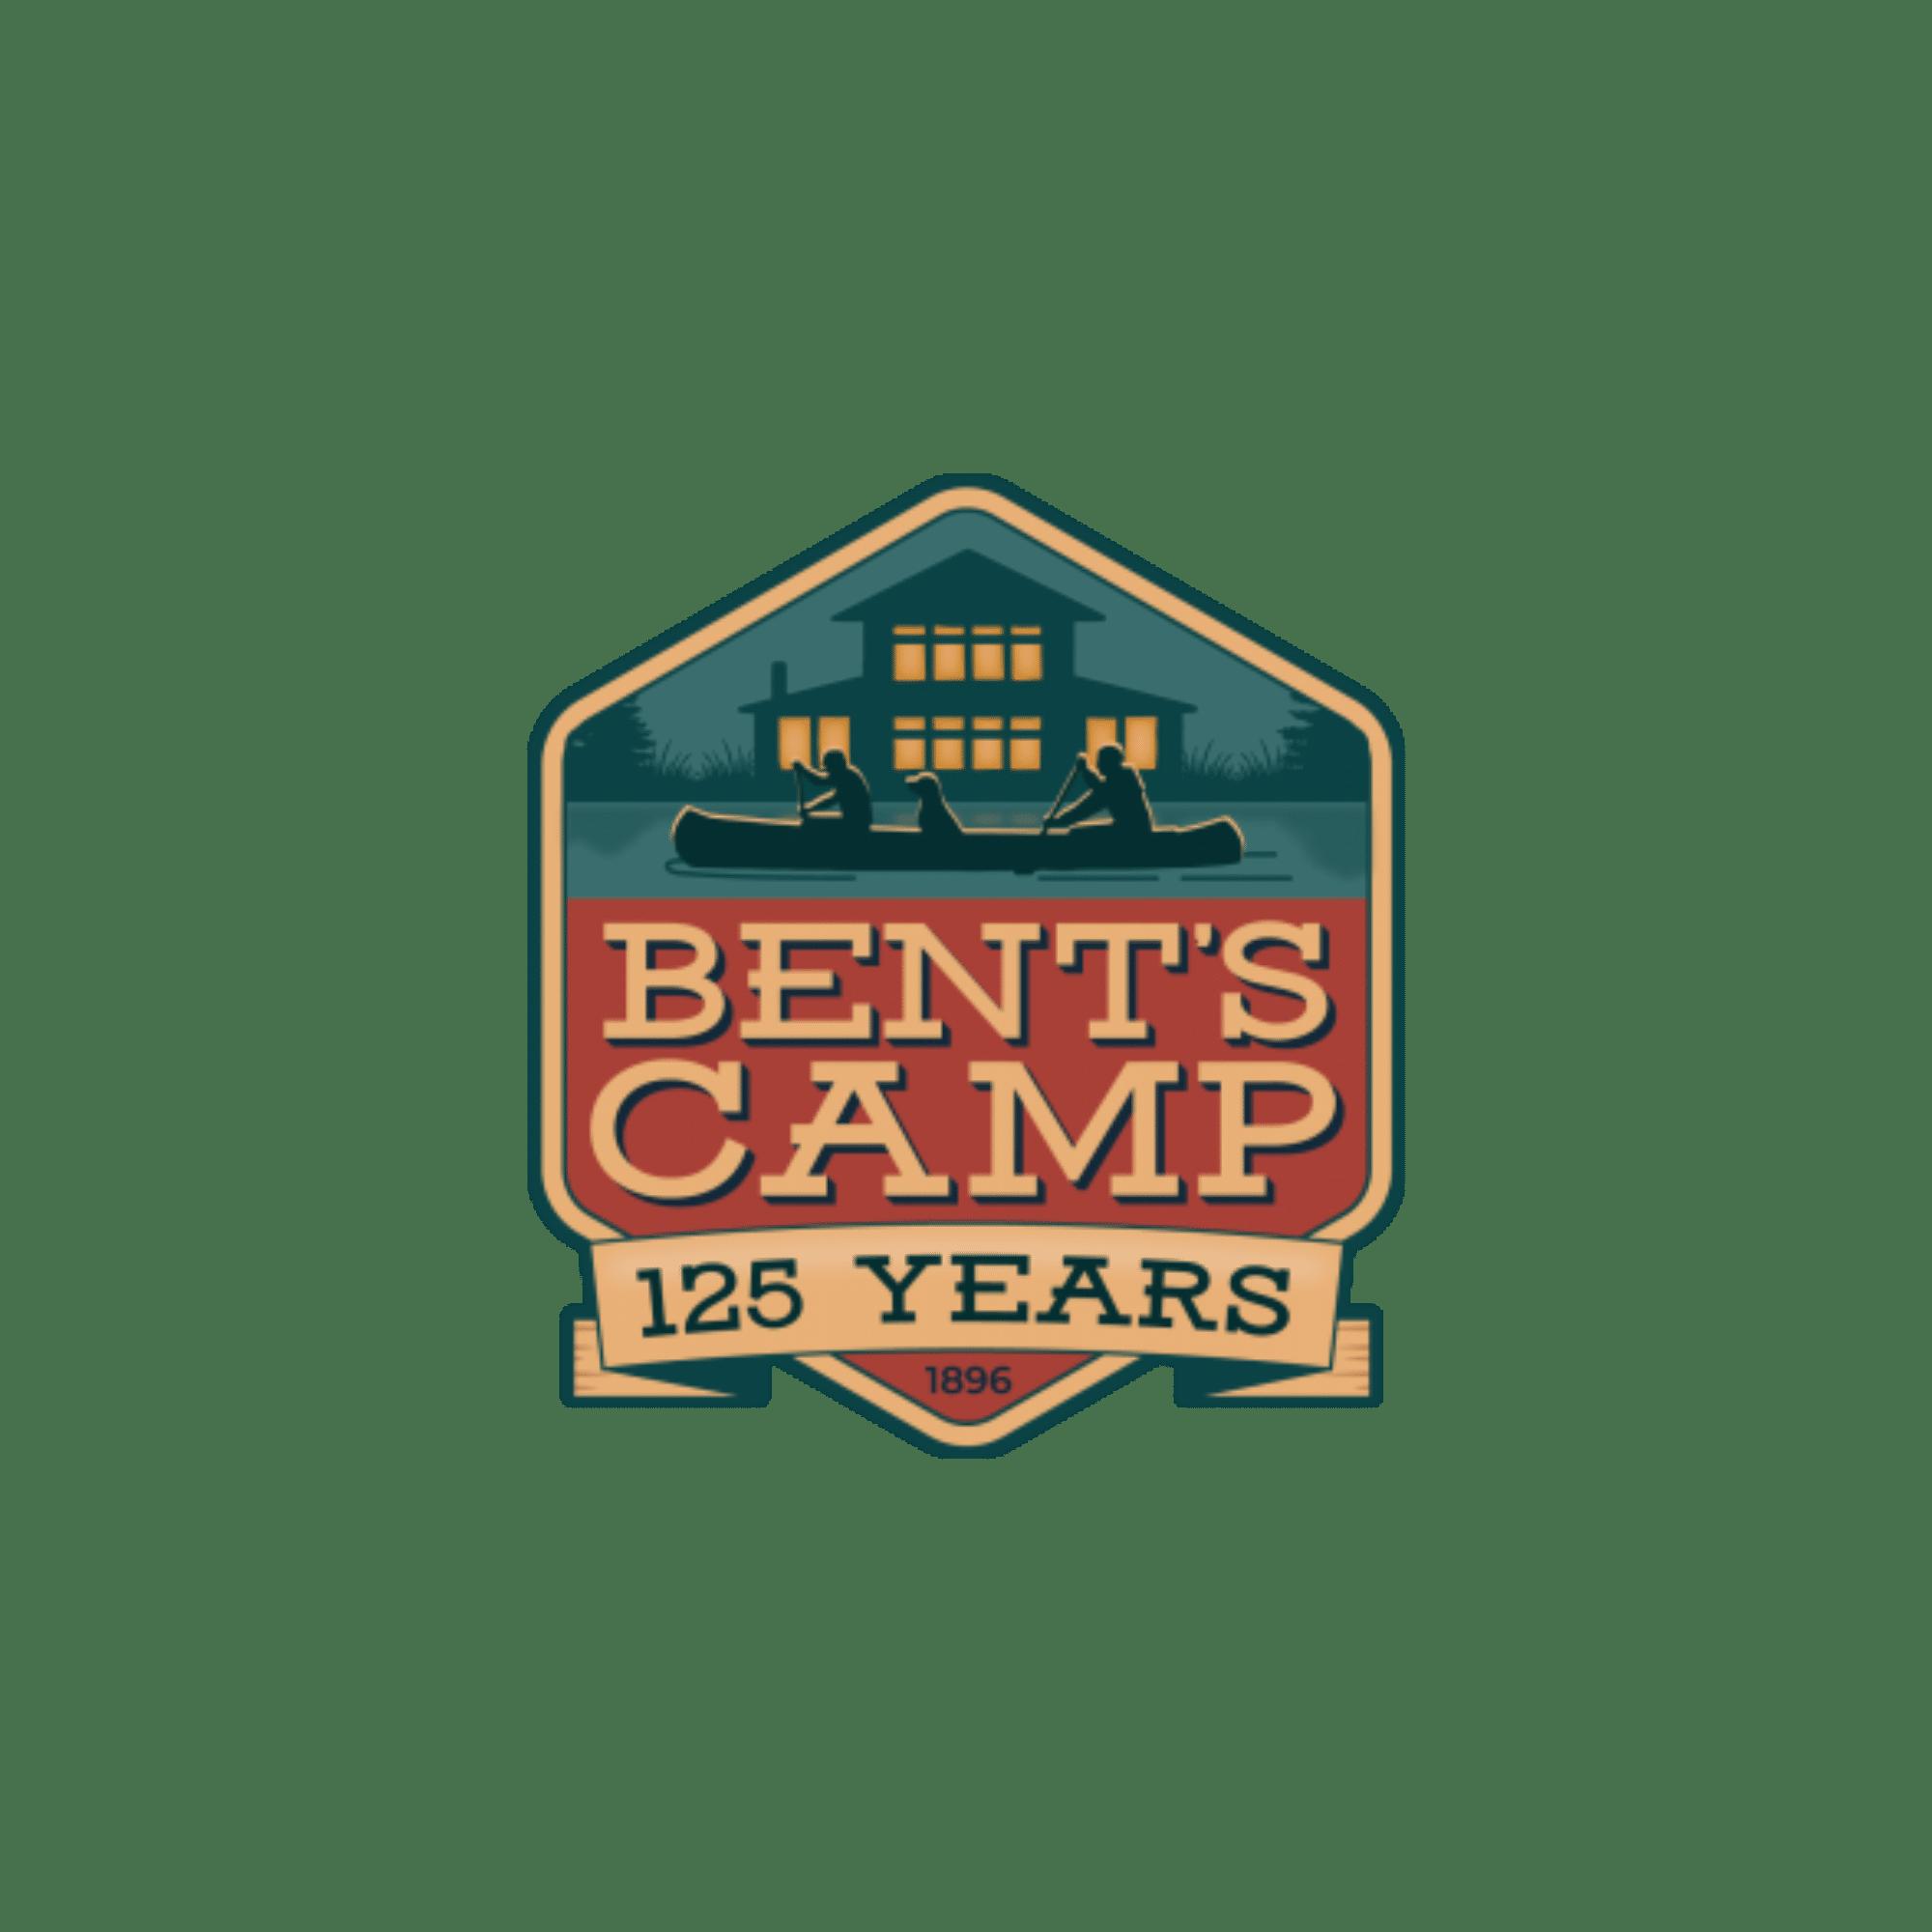 Sponsor bent's camp